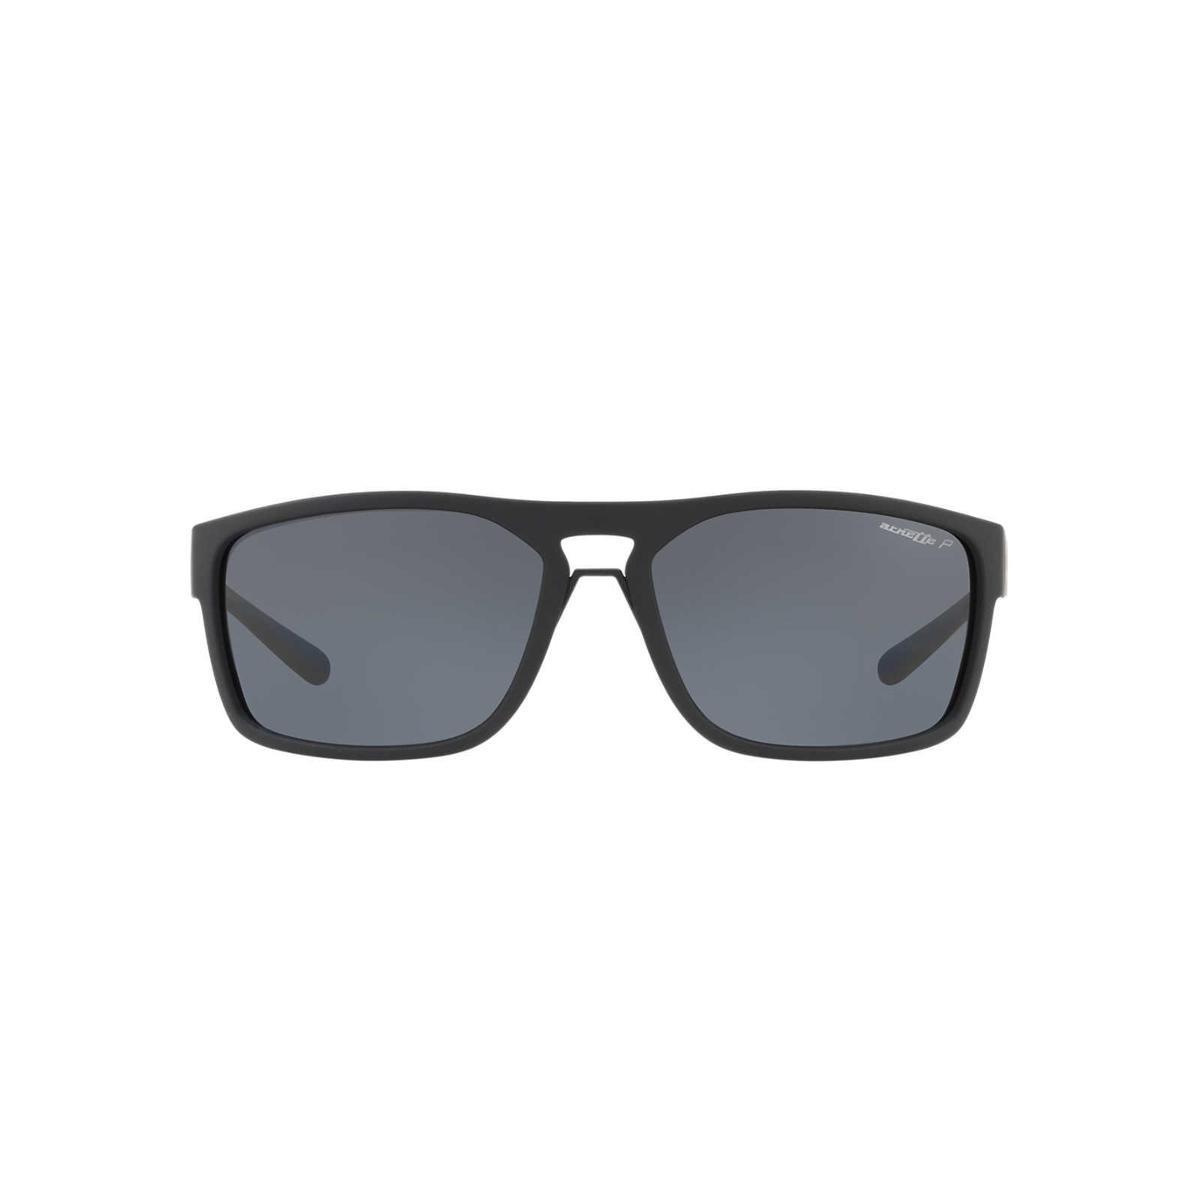 Óculos de Sol Arnette Retangular AN4239 Brapp Masculino - Preto ... 96035003a2